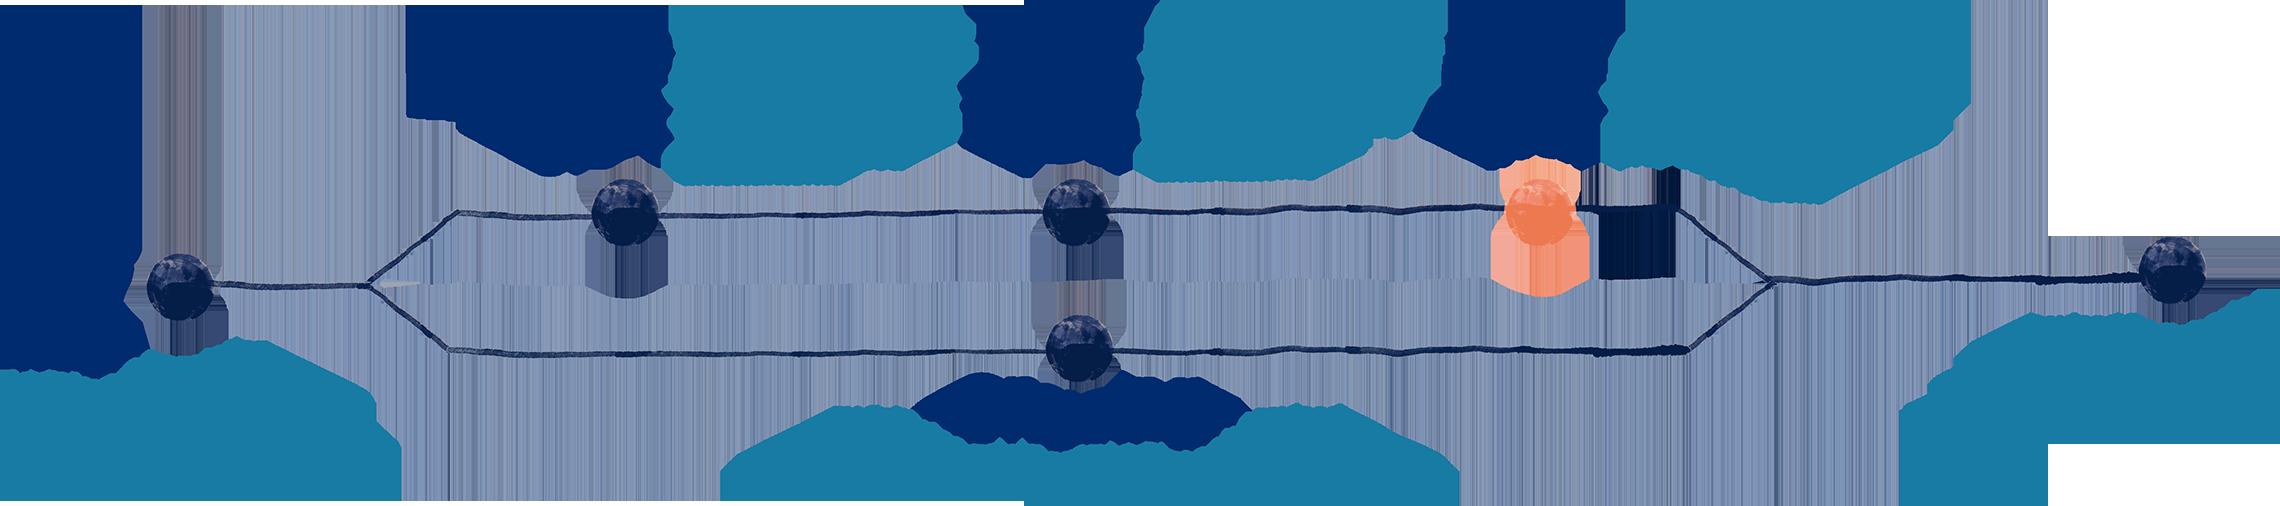 Progress towards a sustainable EU seafood system - Timeline